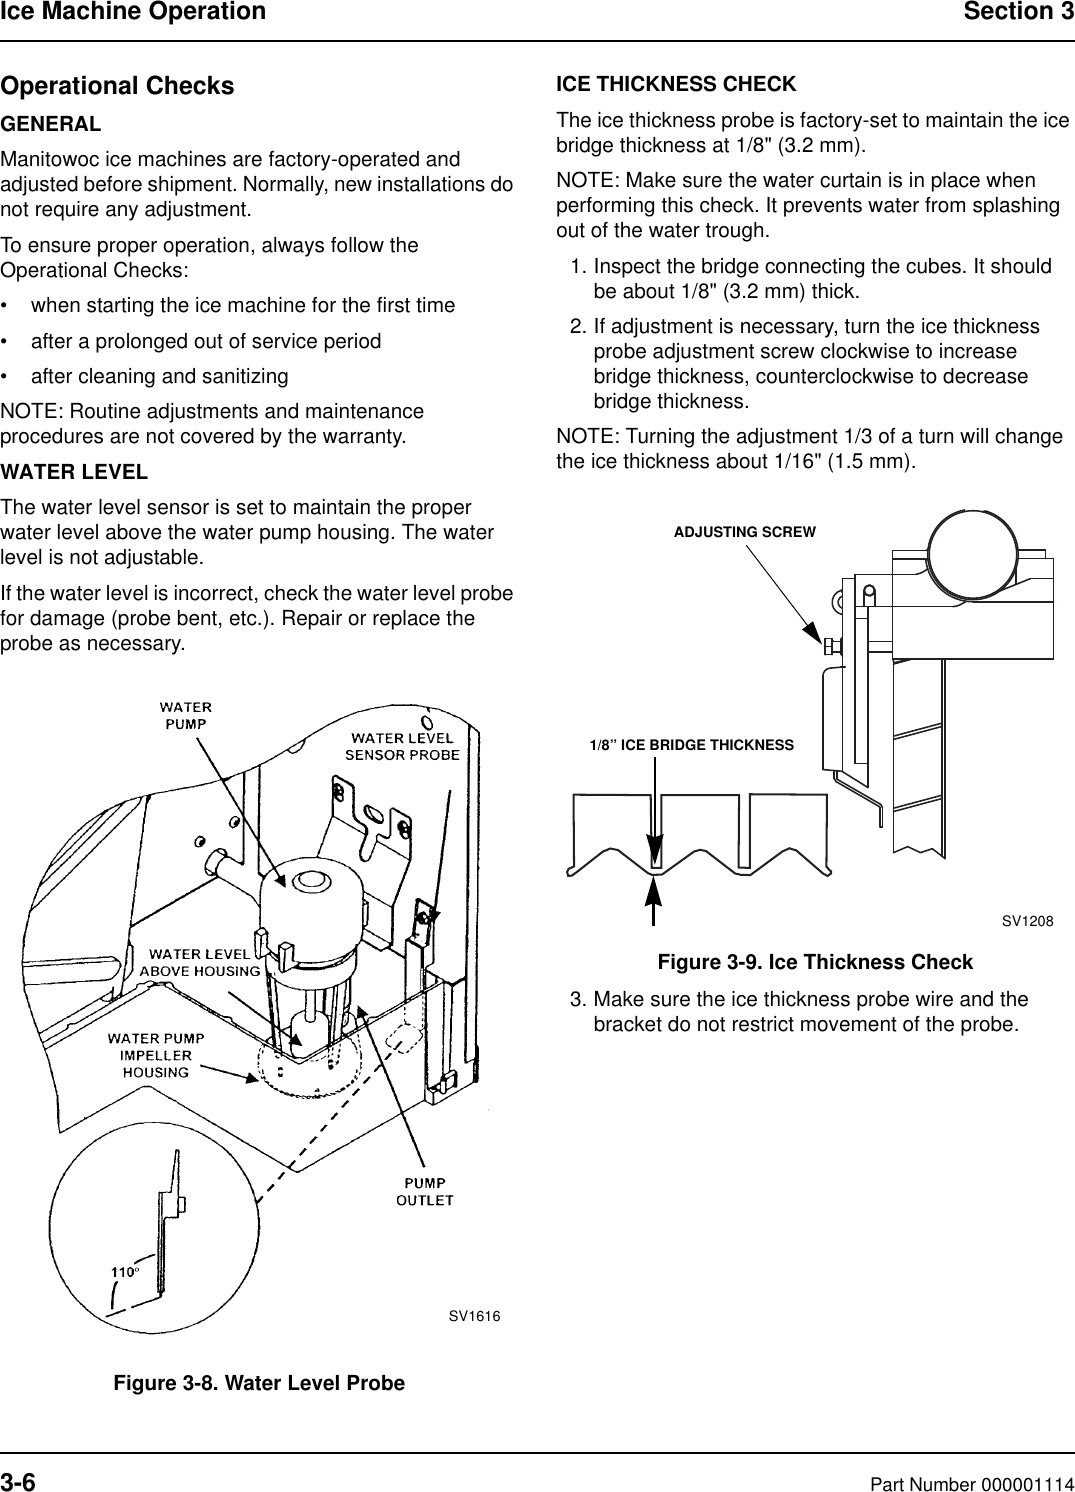 Manitowoc Ice Aucs Q Users Manual Q__uc_000001114 on